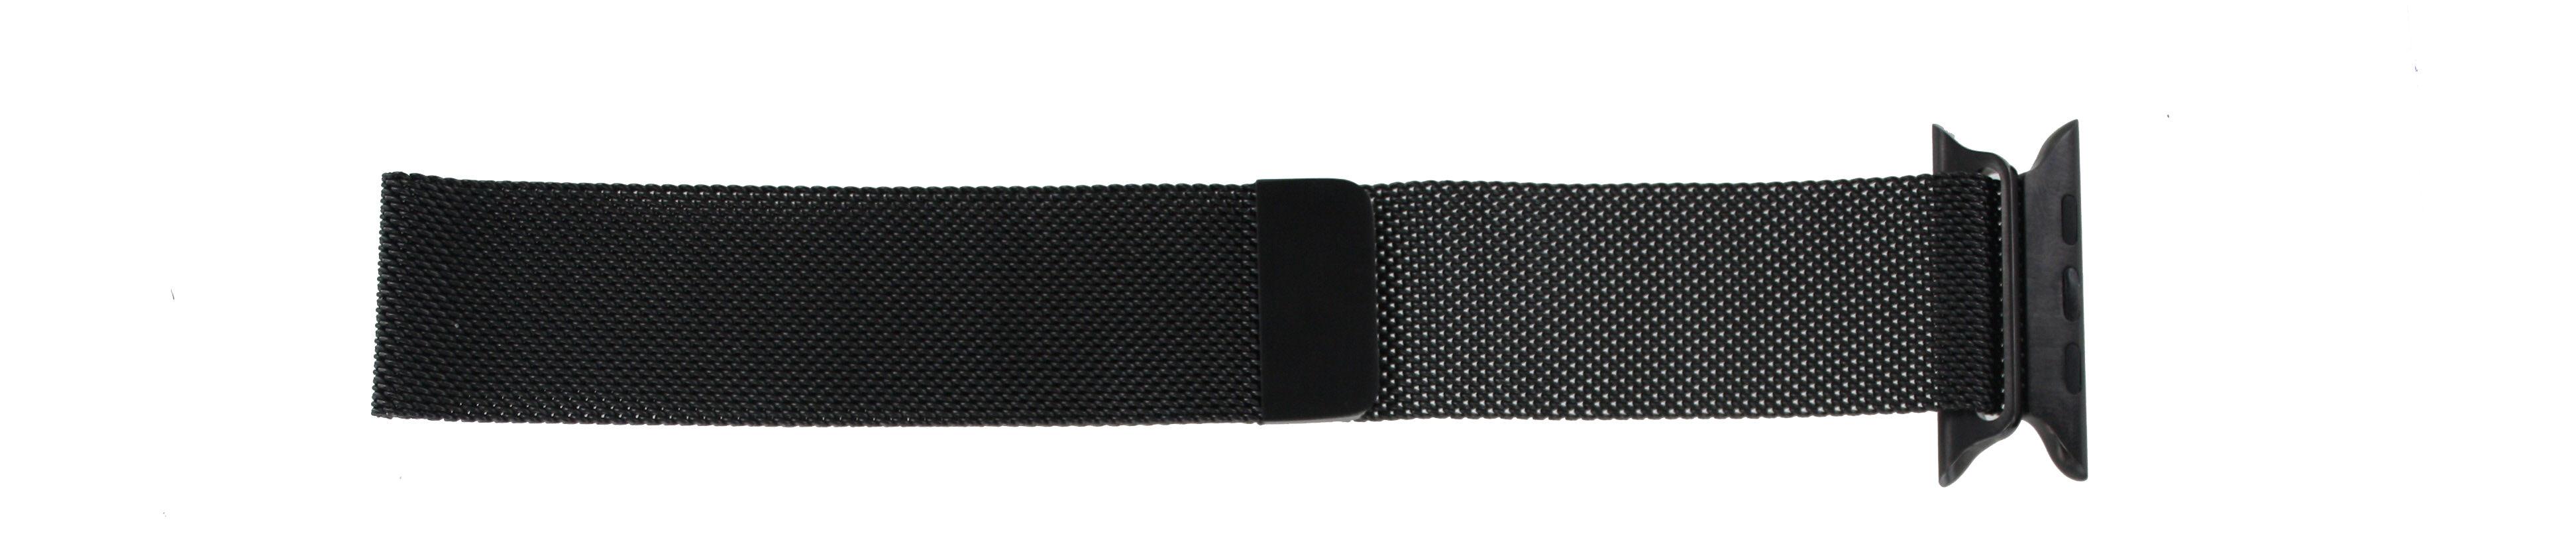 Apple (replacement model) klockarmband LS.AB.108 Stål Svart 42mm